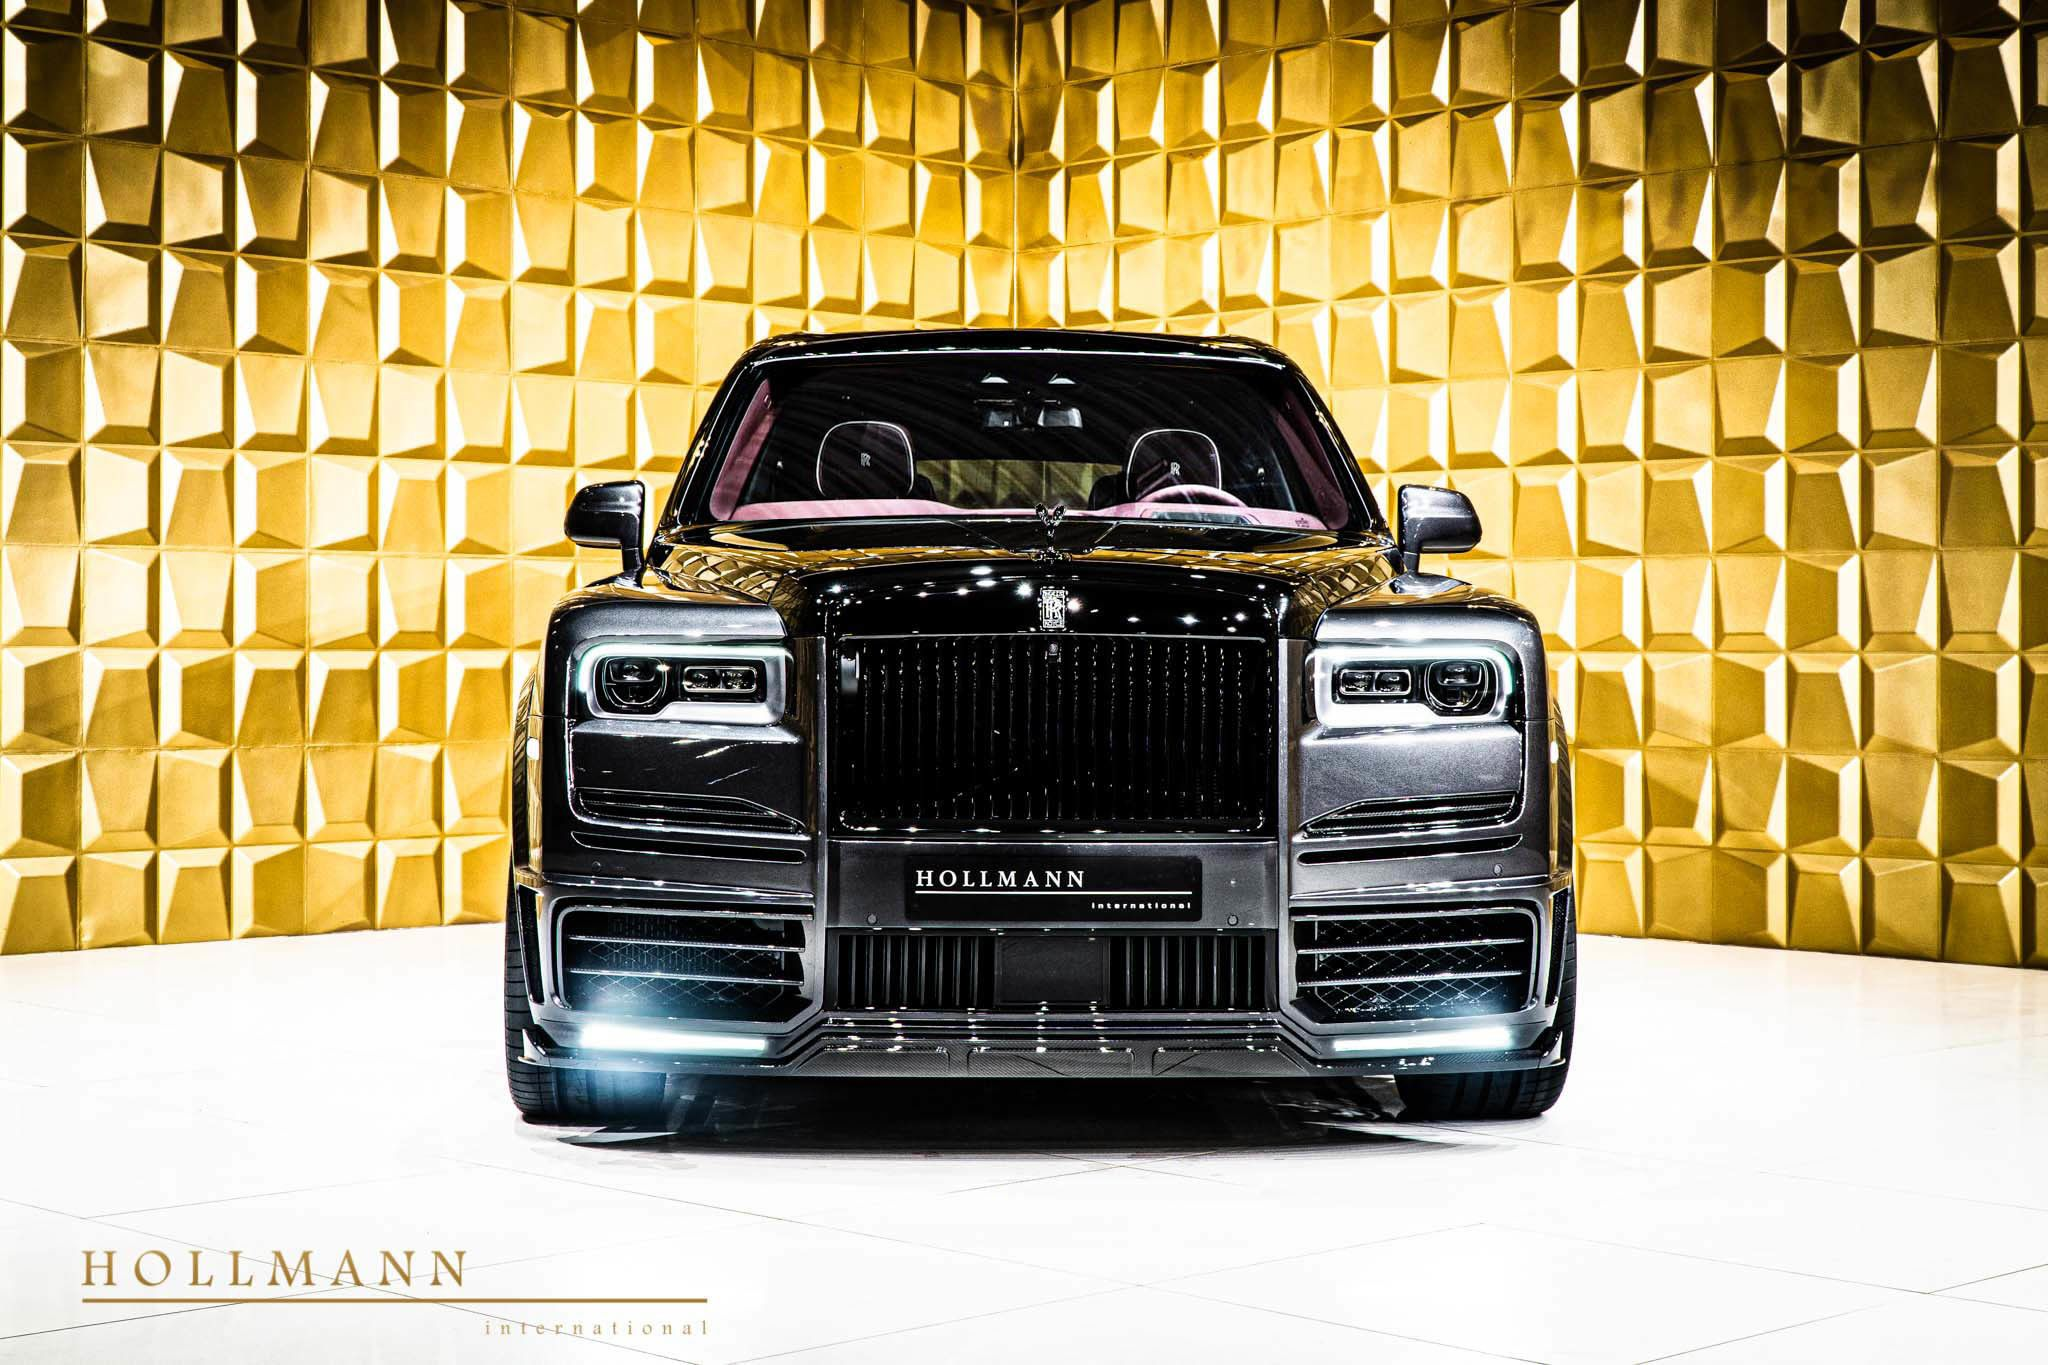 For Sale Rolls Royce Cullinan By Mansory Hollmann International Germany For Sale On Luxurypulse Rolls Royce Cullinan Rolls Royce Vintage Rolls Royce